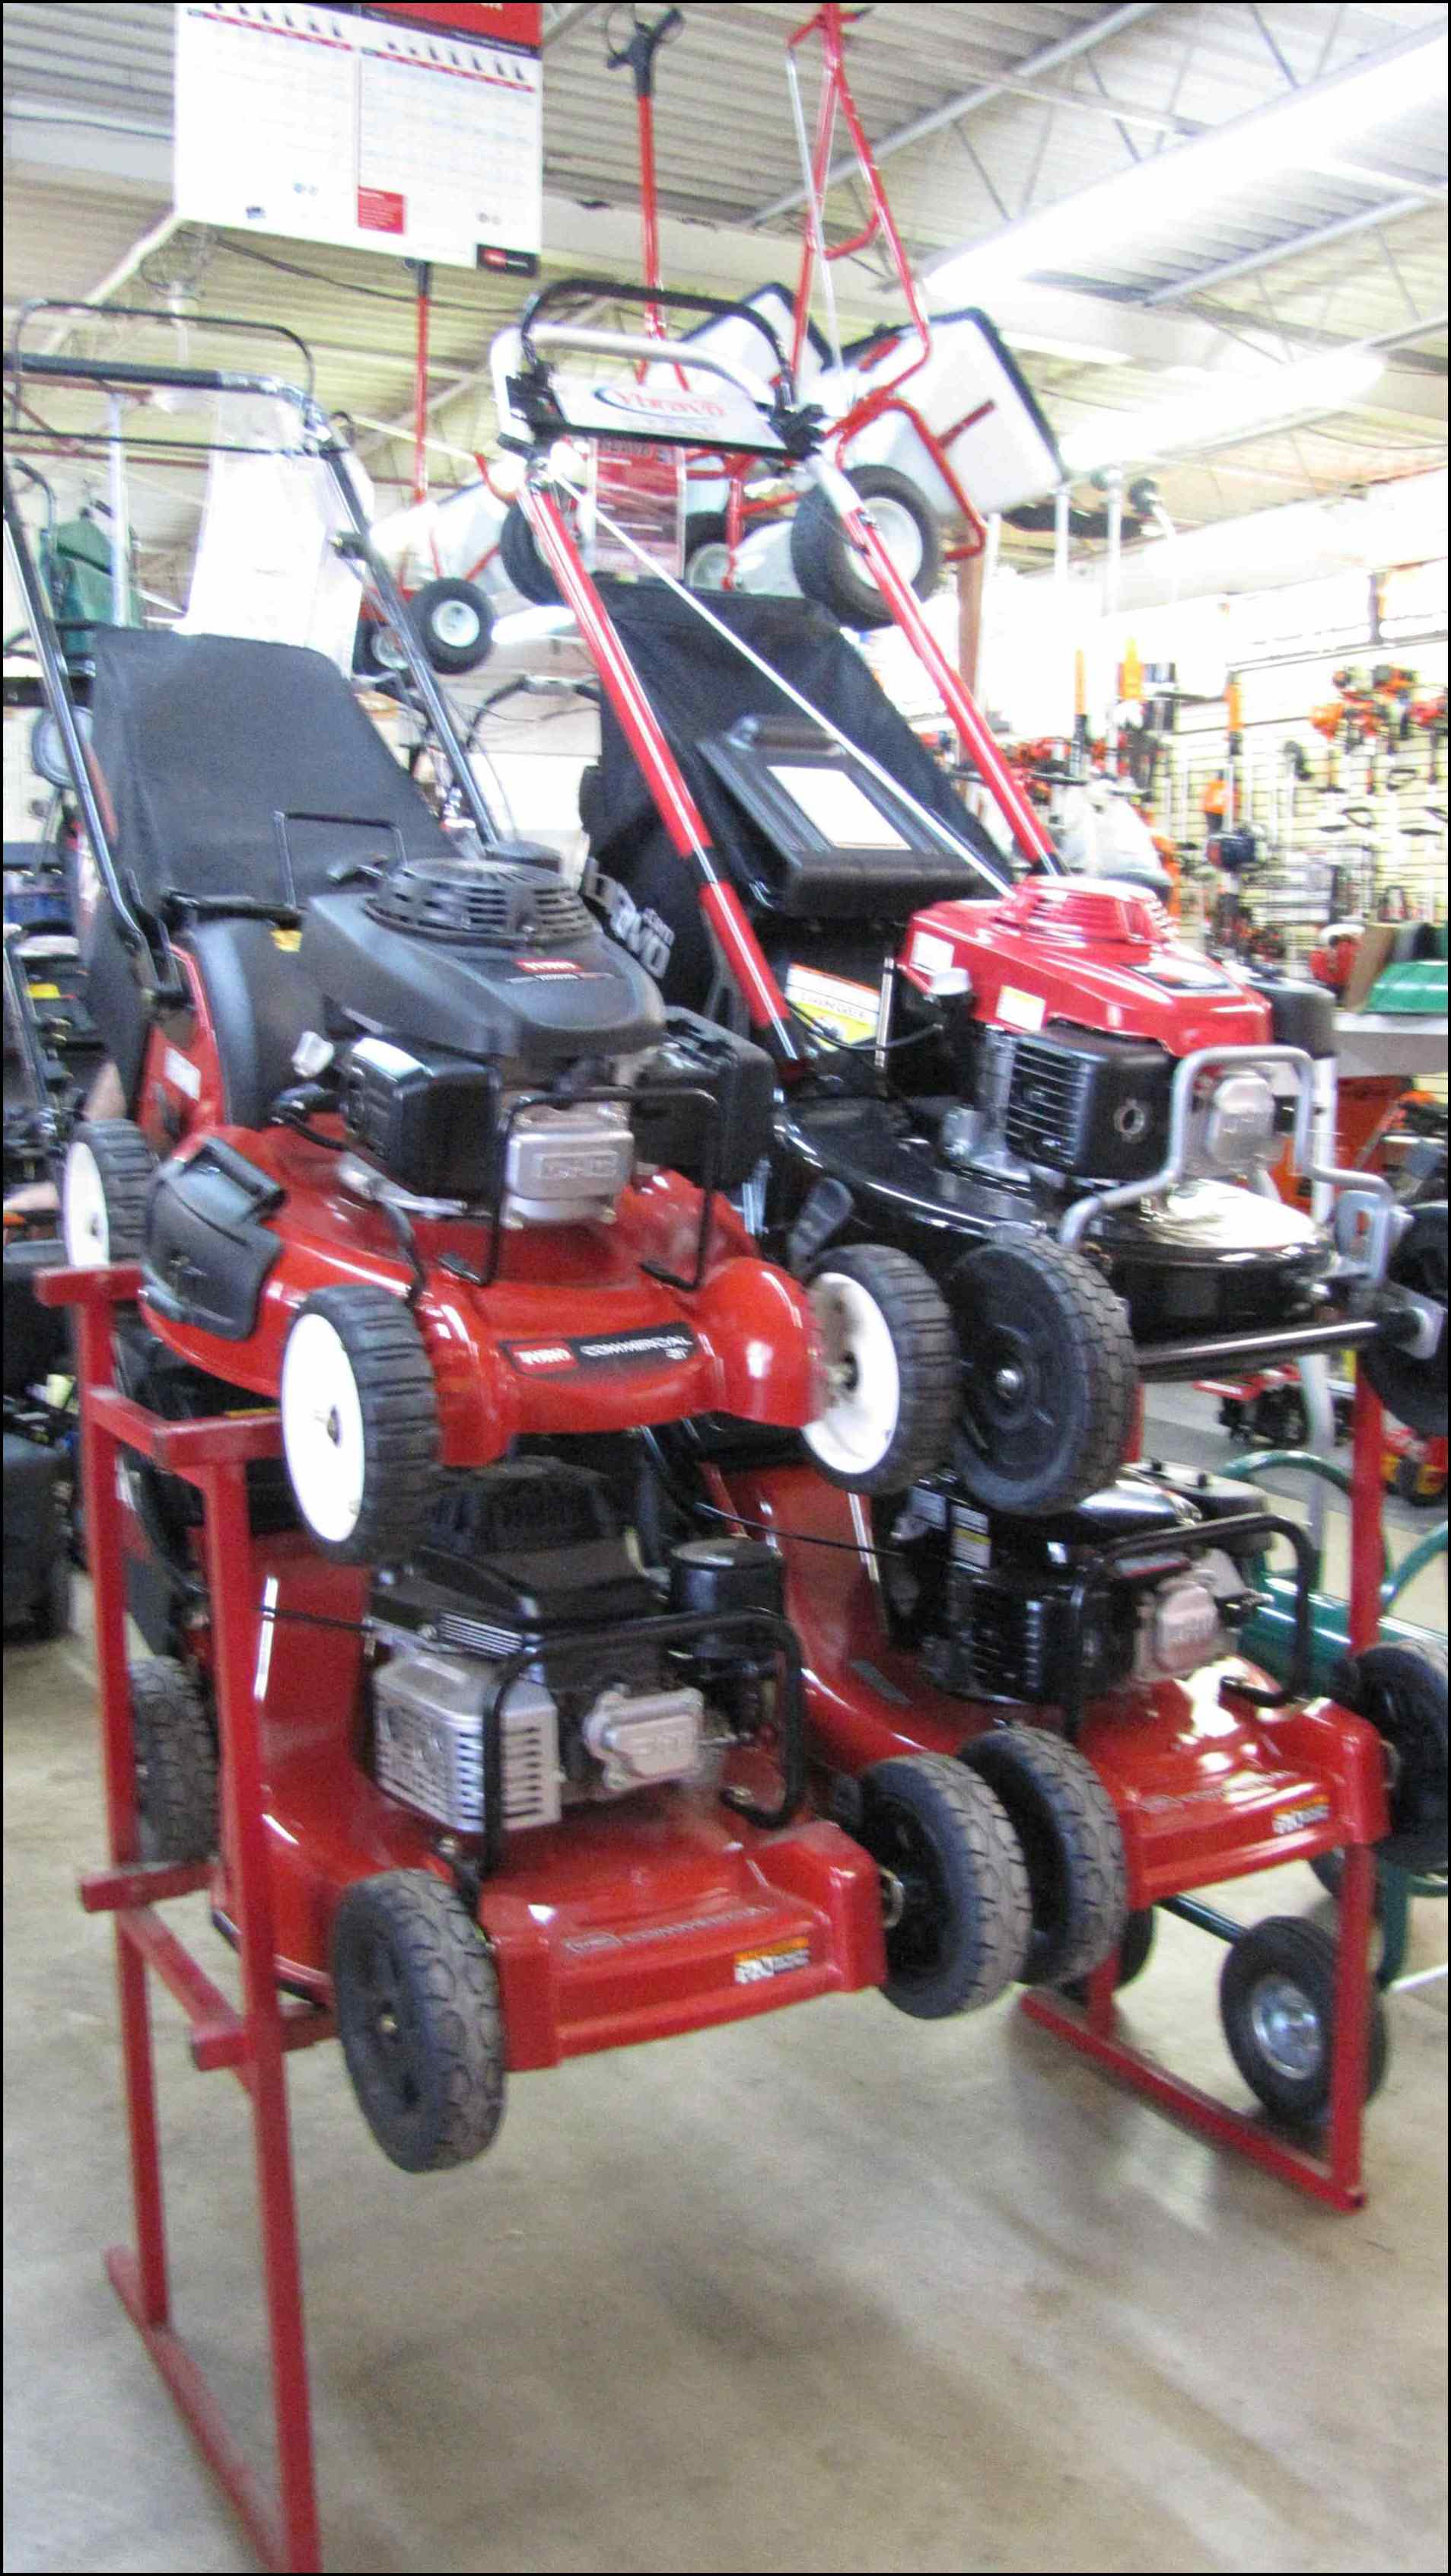 Sears Lawn Mower Repair Center